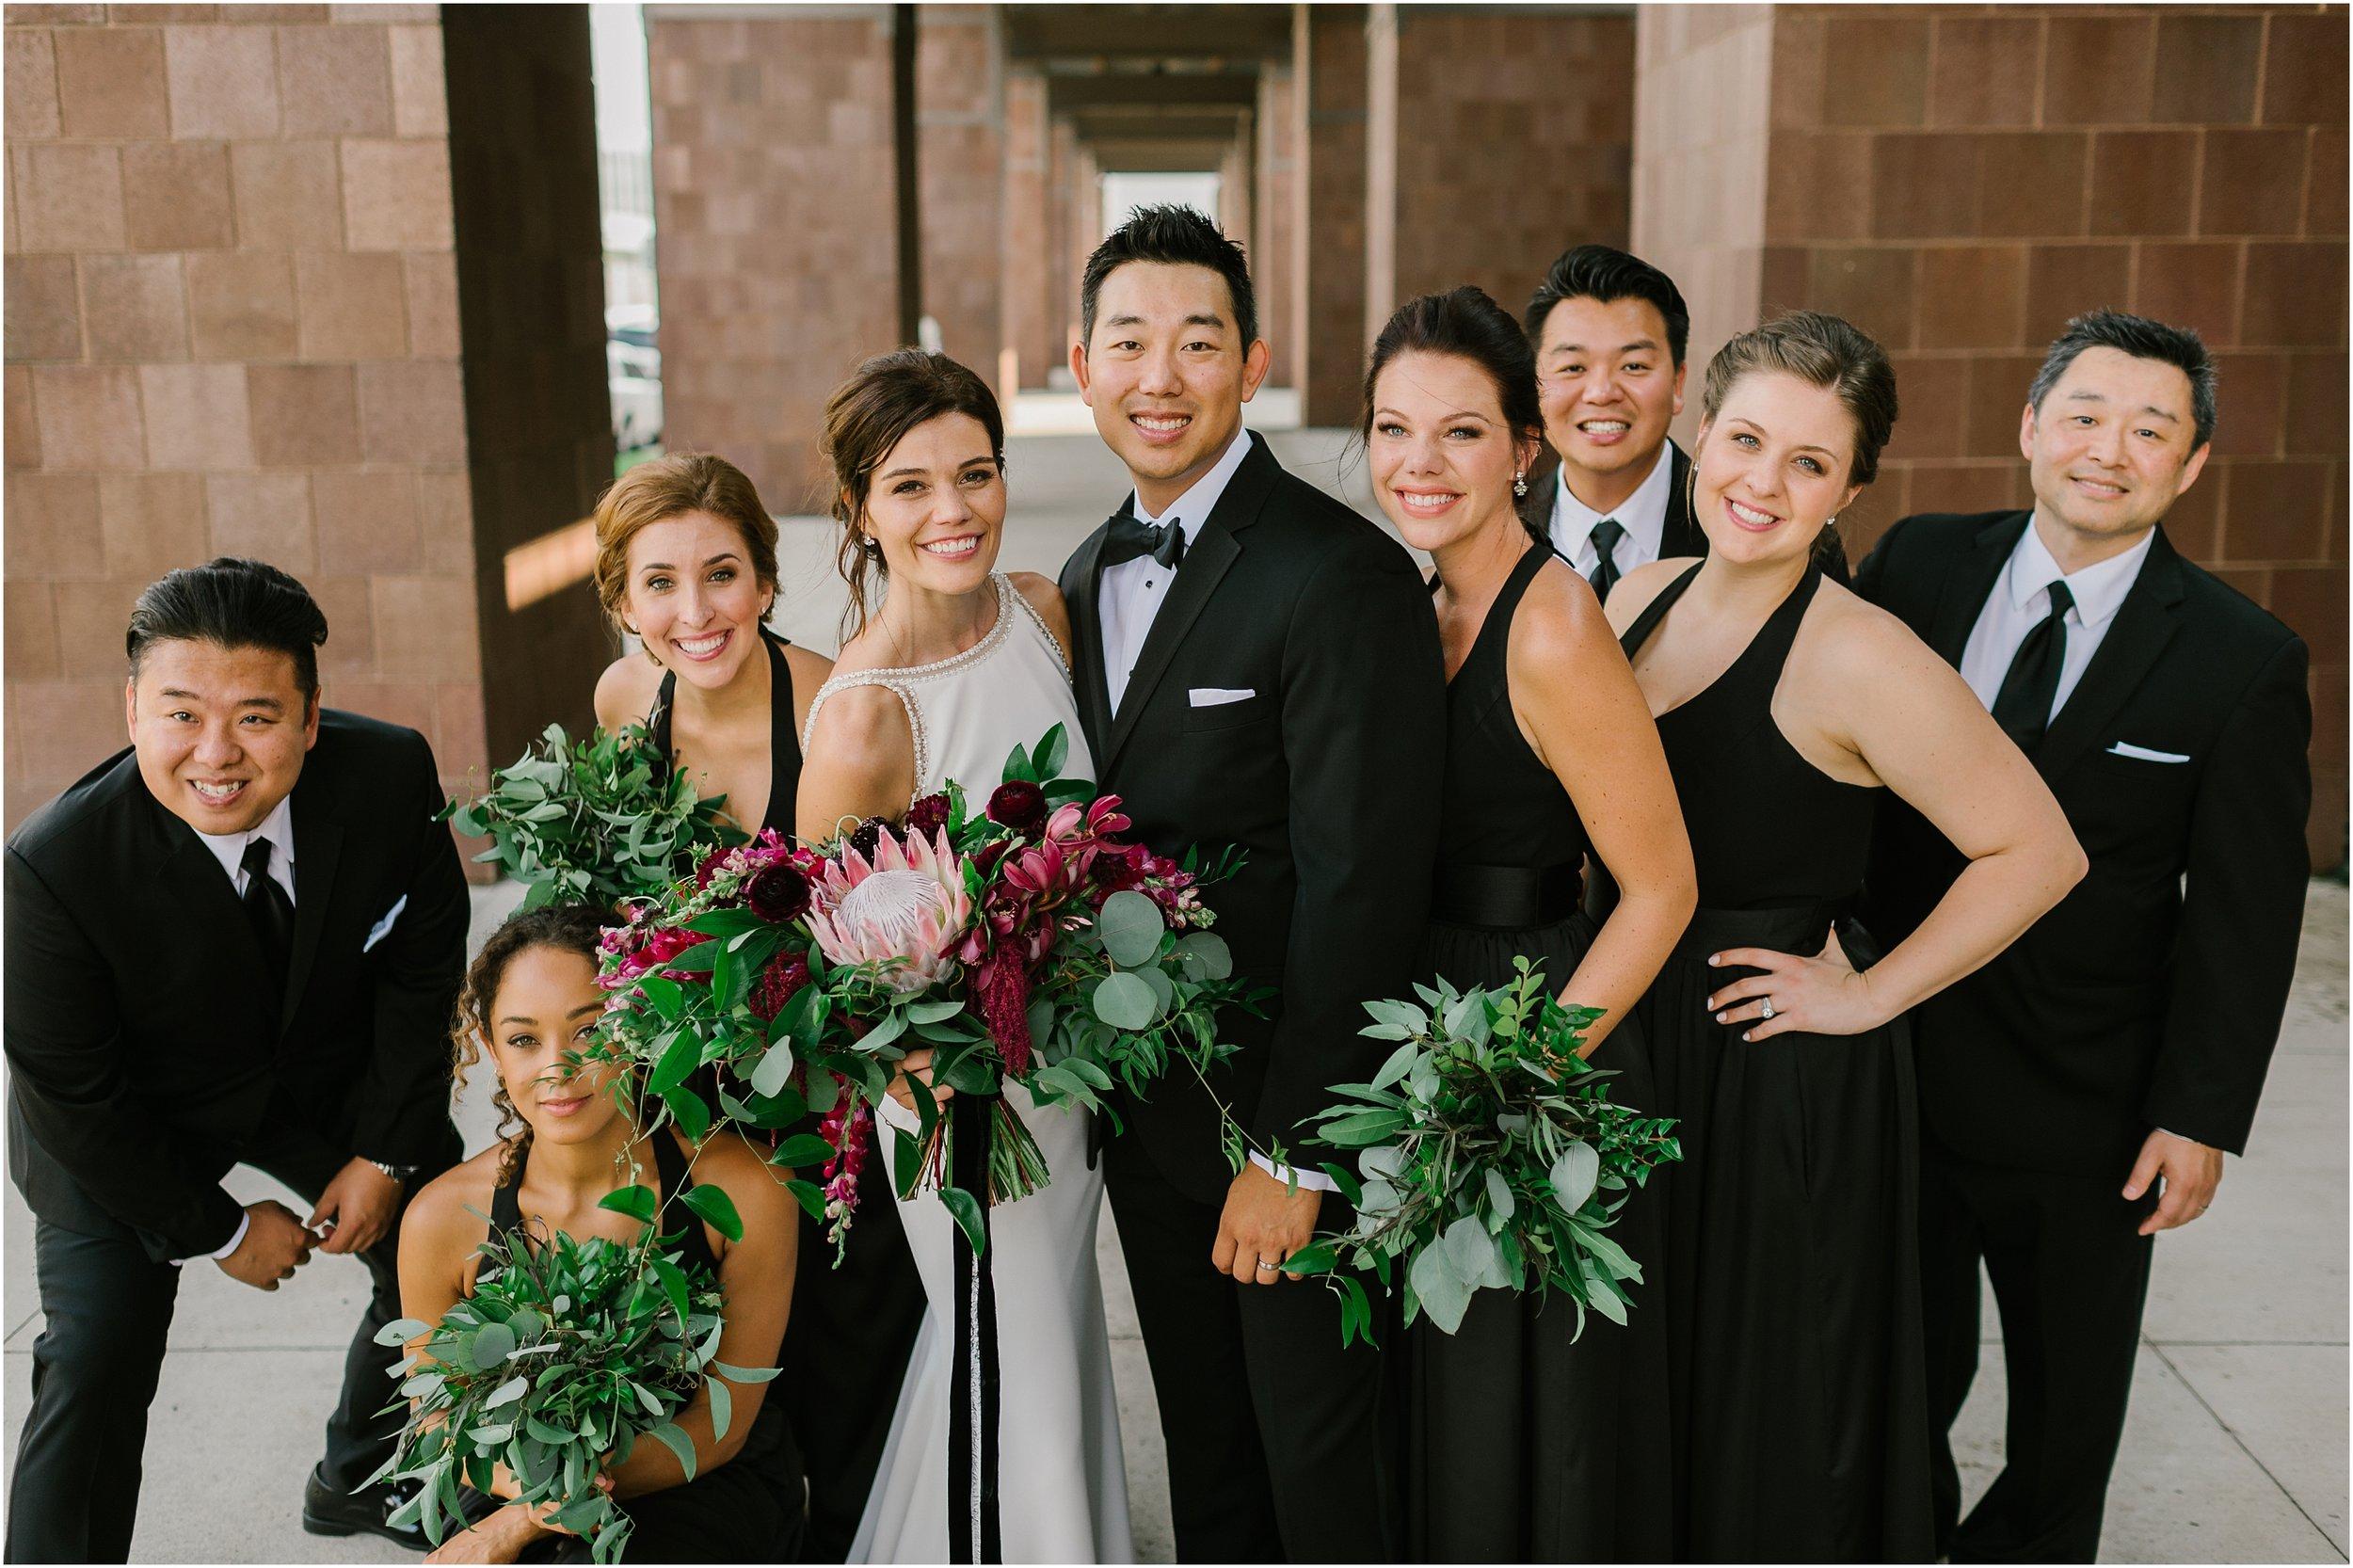 Rebecca_Shehorn_Photography_Indianapolis Wedding Photographer Sycamore at Mallow Run Wedding_9752.jpg